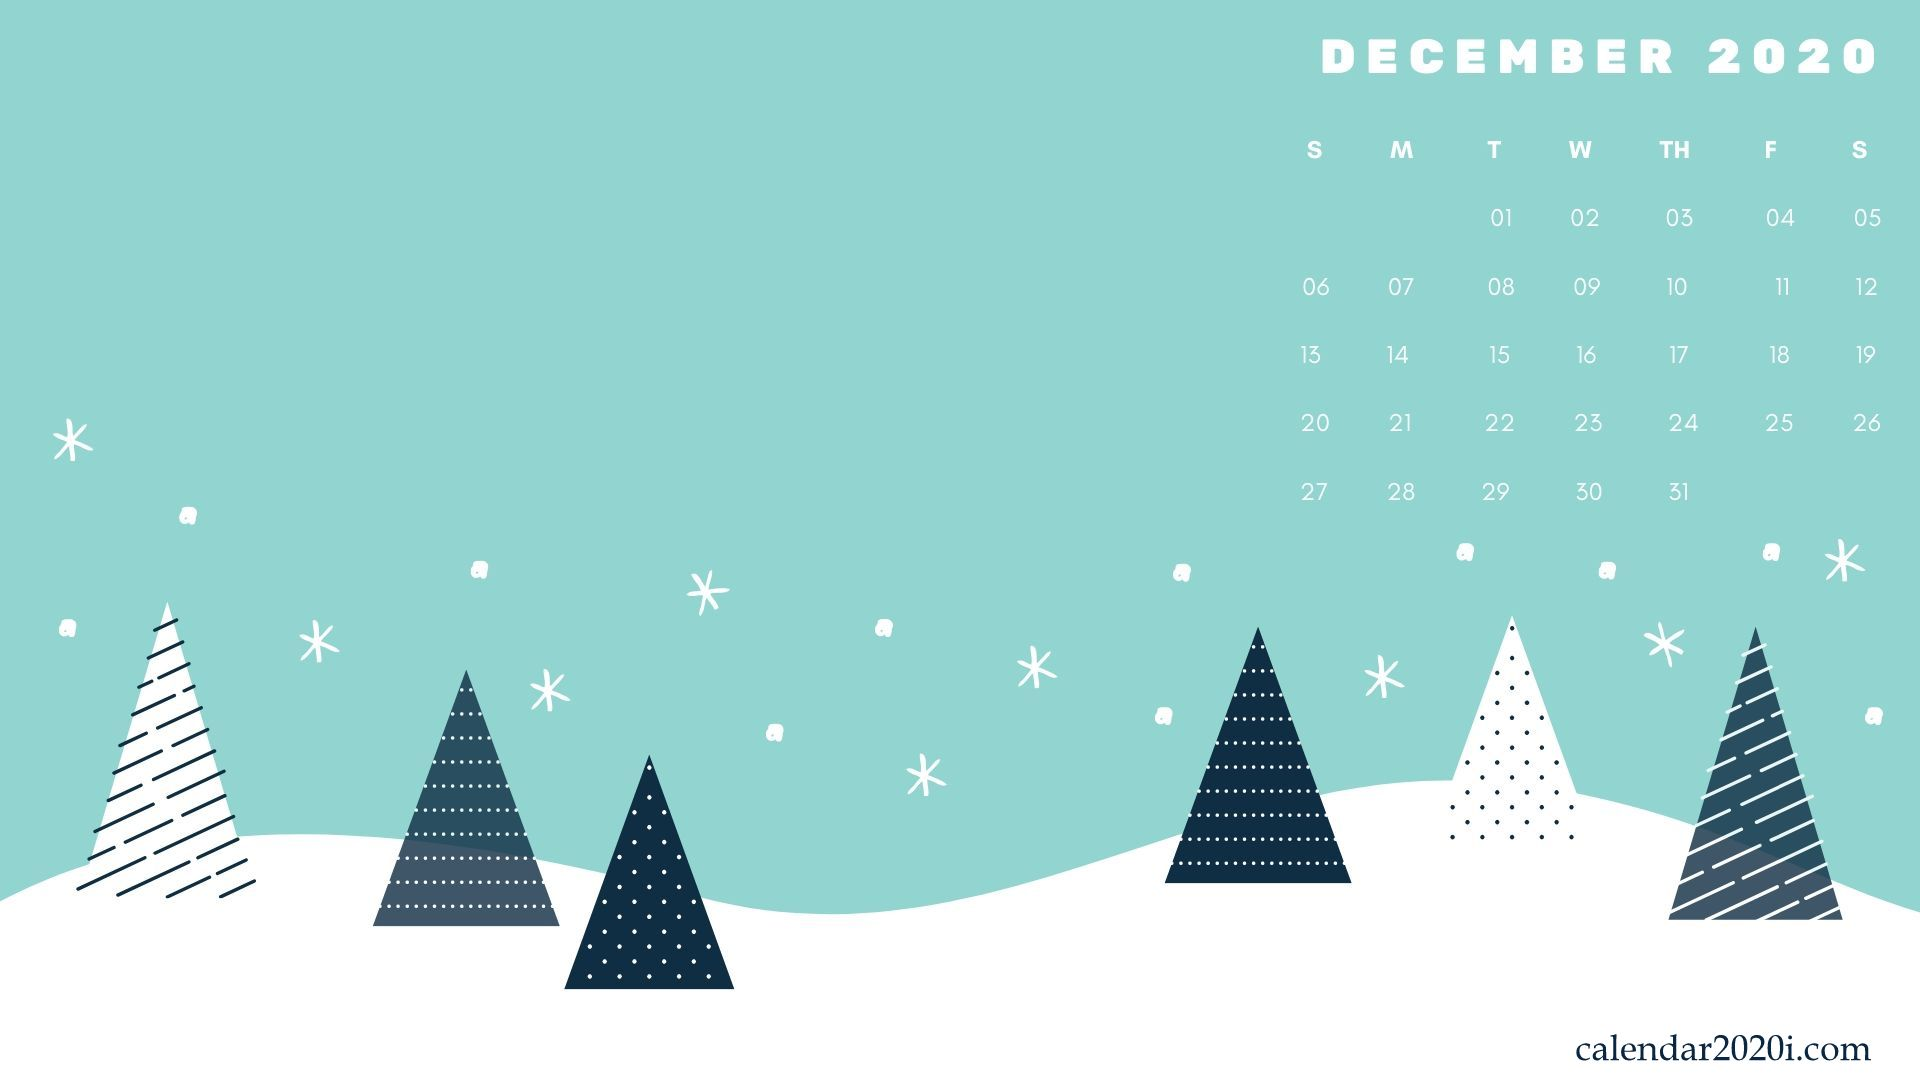 December 2020 Desktop Calendar